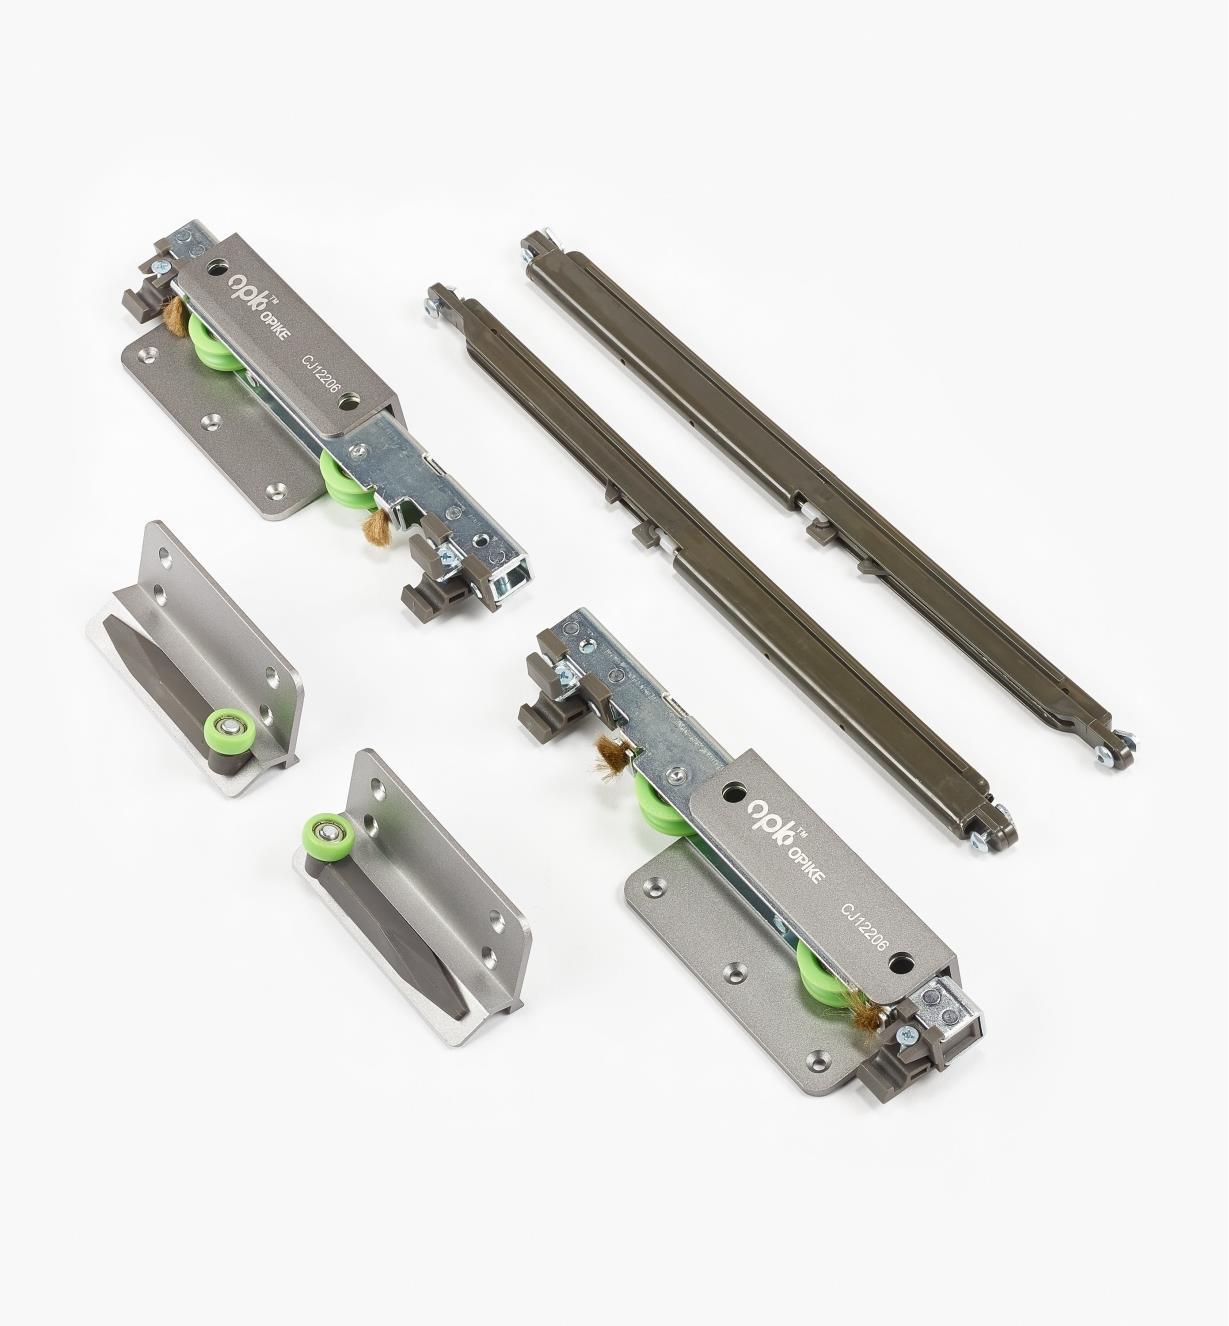 00B1136 - Overlay Bypass Sliding Door Hardware, Inner Door Hardware